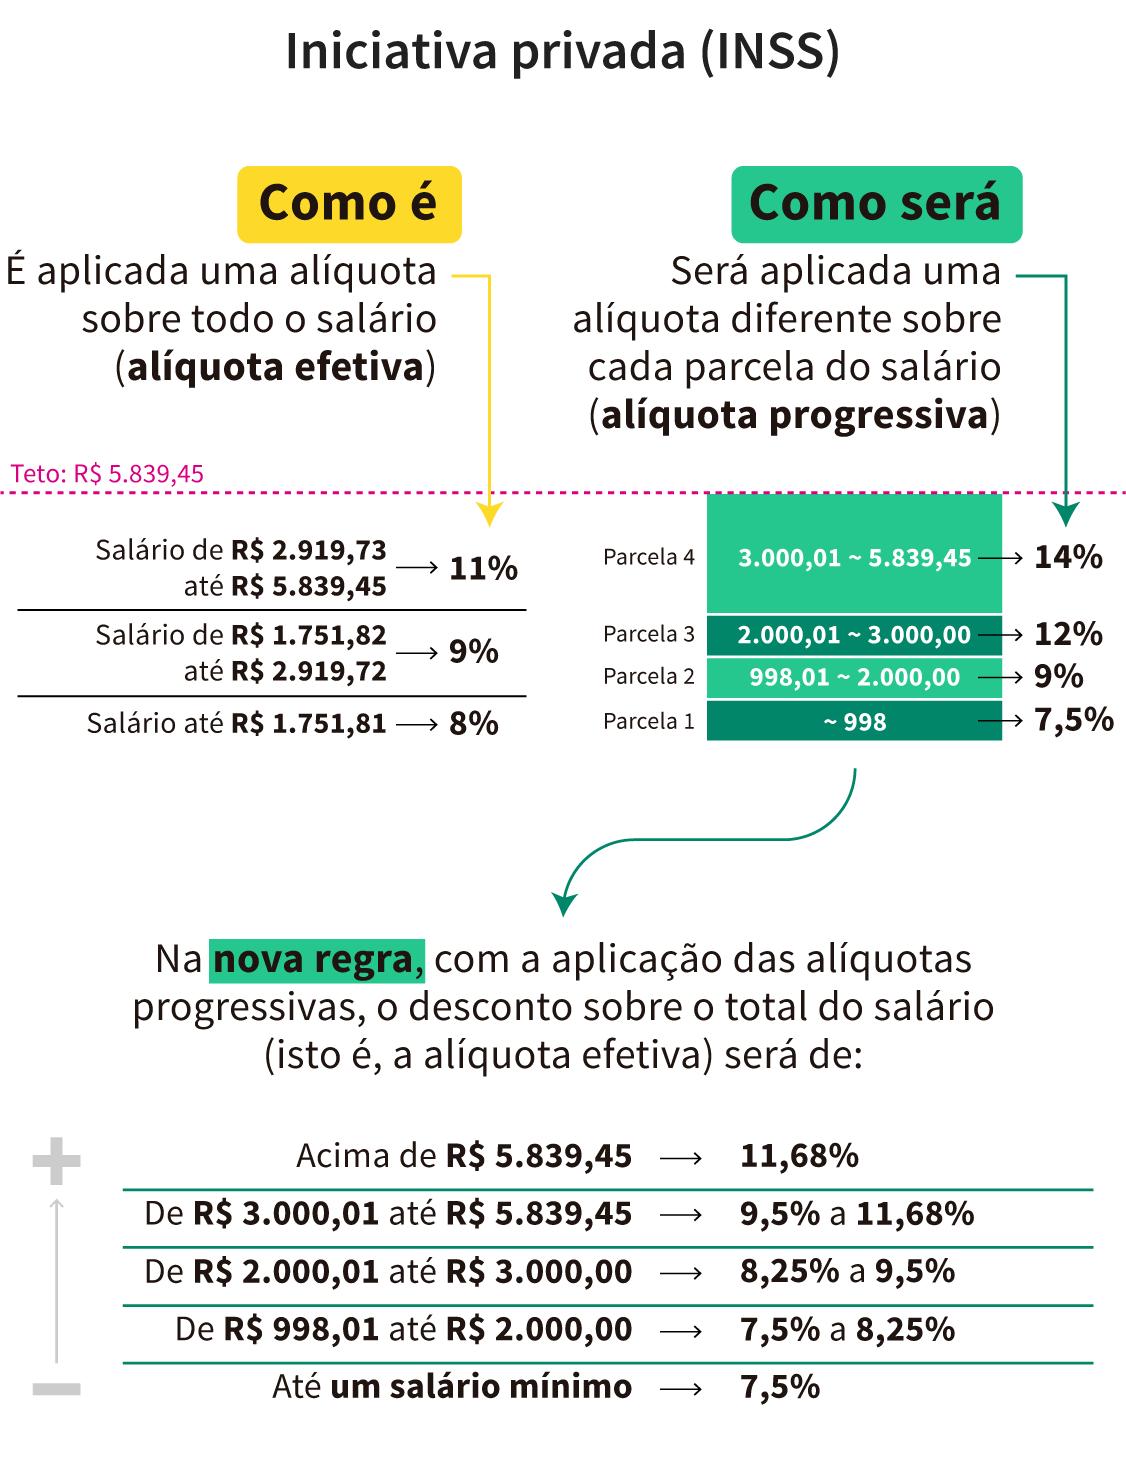 Infográfico: alíquotas da nova previdência (Iniciativa Privada - INSS)